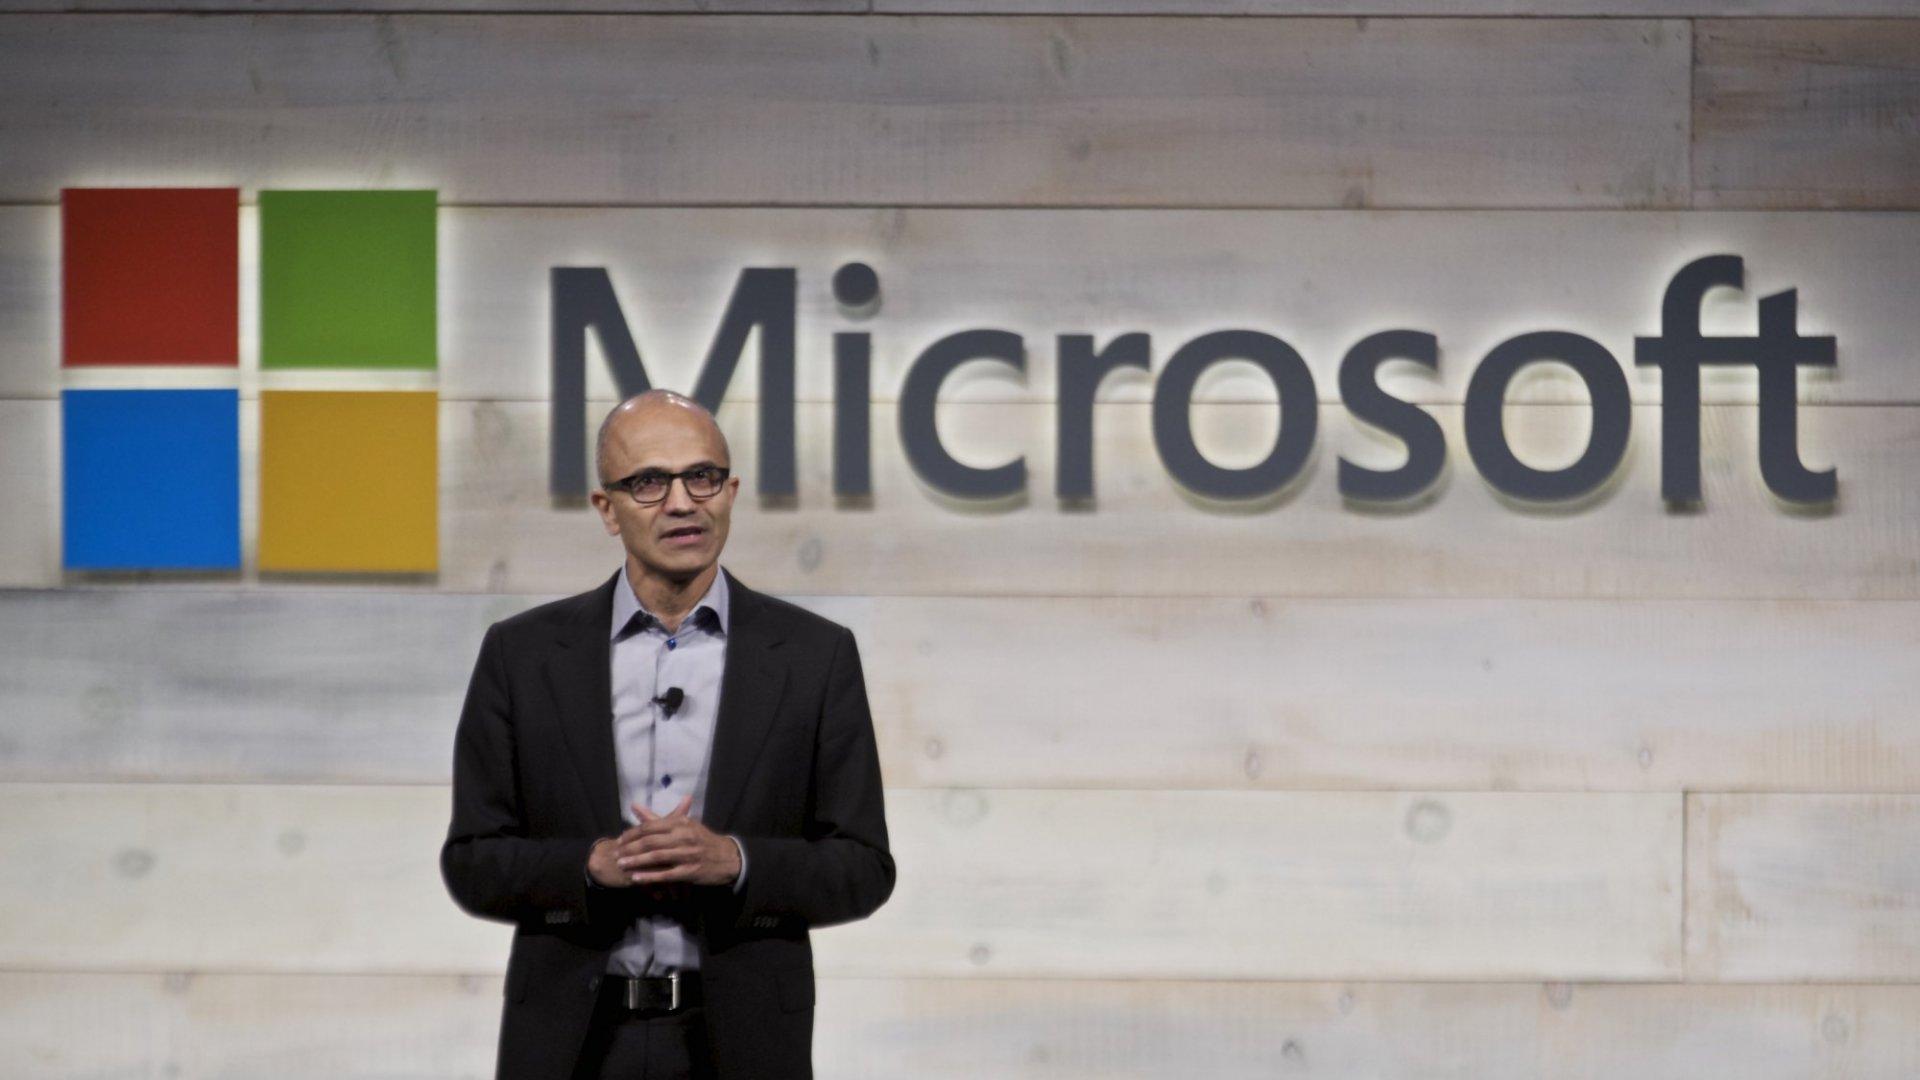 Microsoft Donates $1 Billion Worth of Cloud Computing Services to Charity